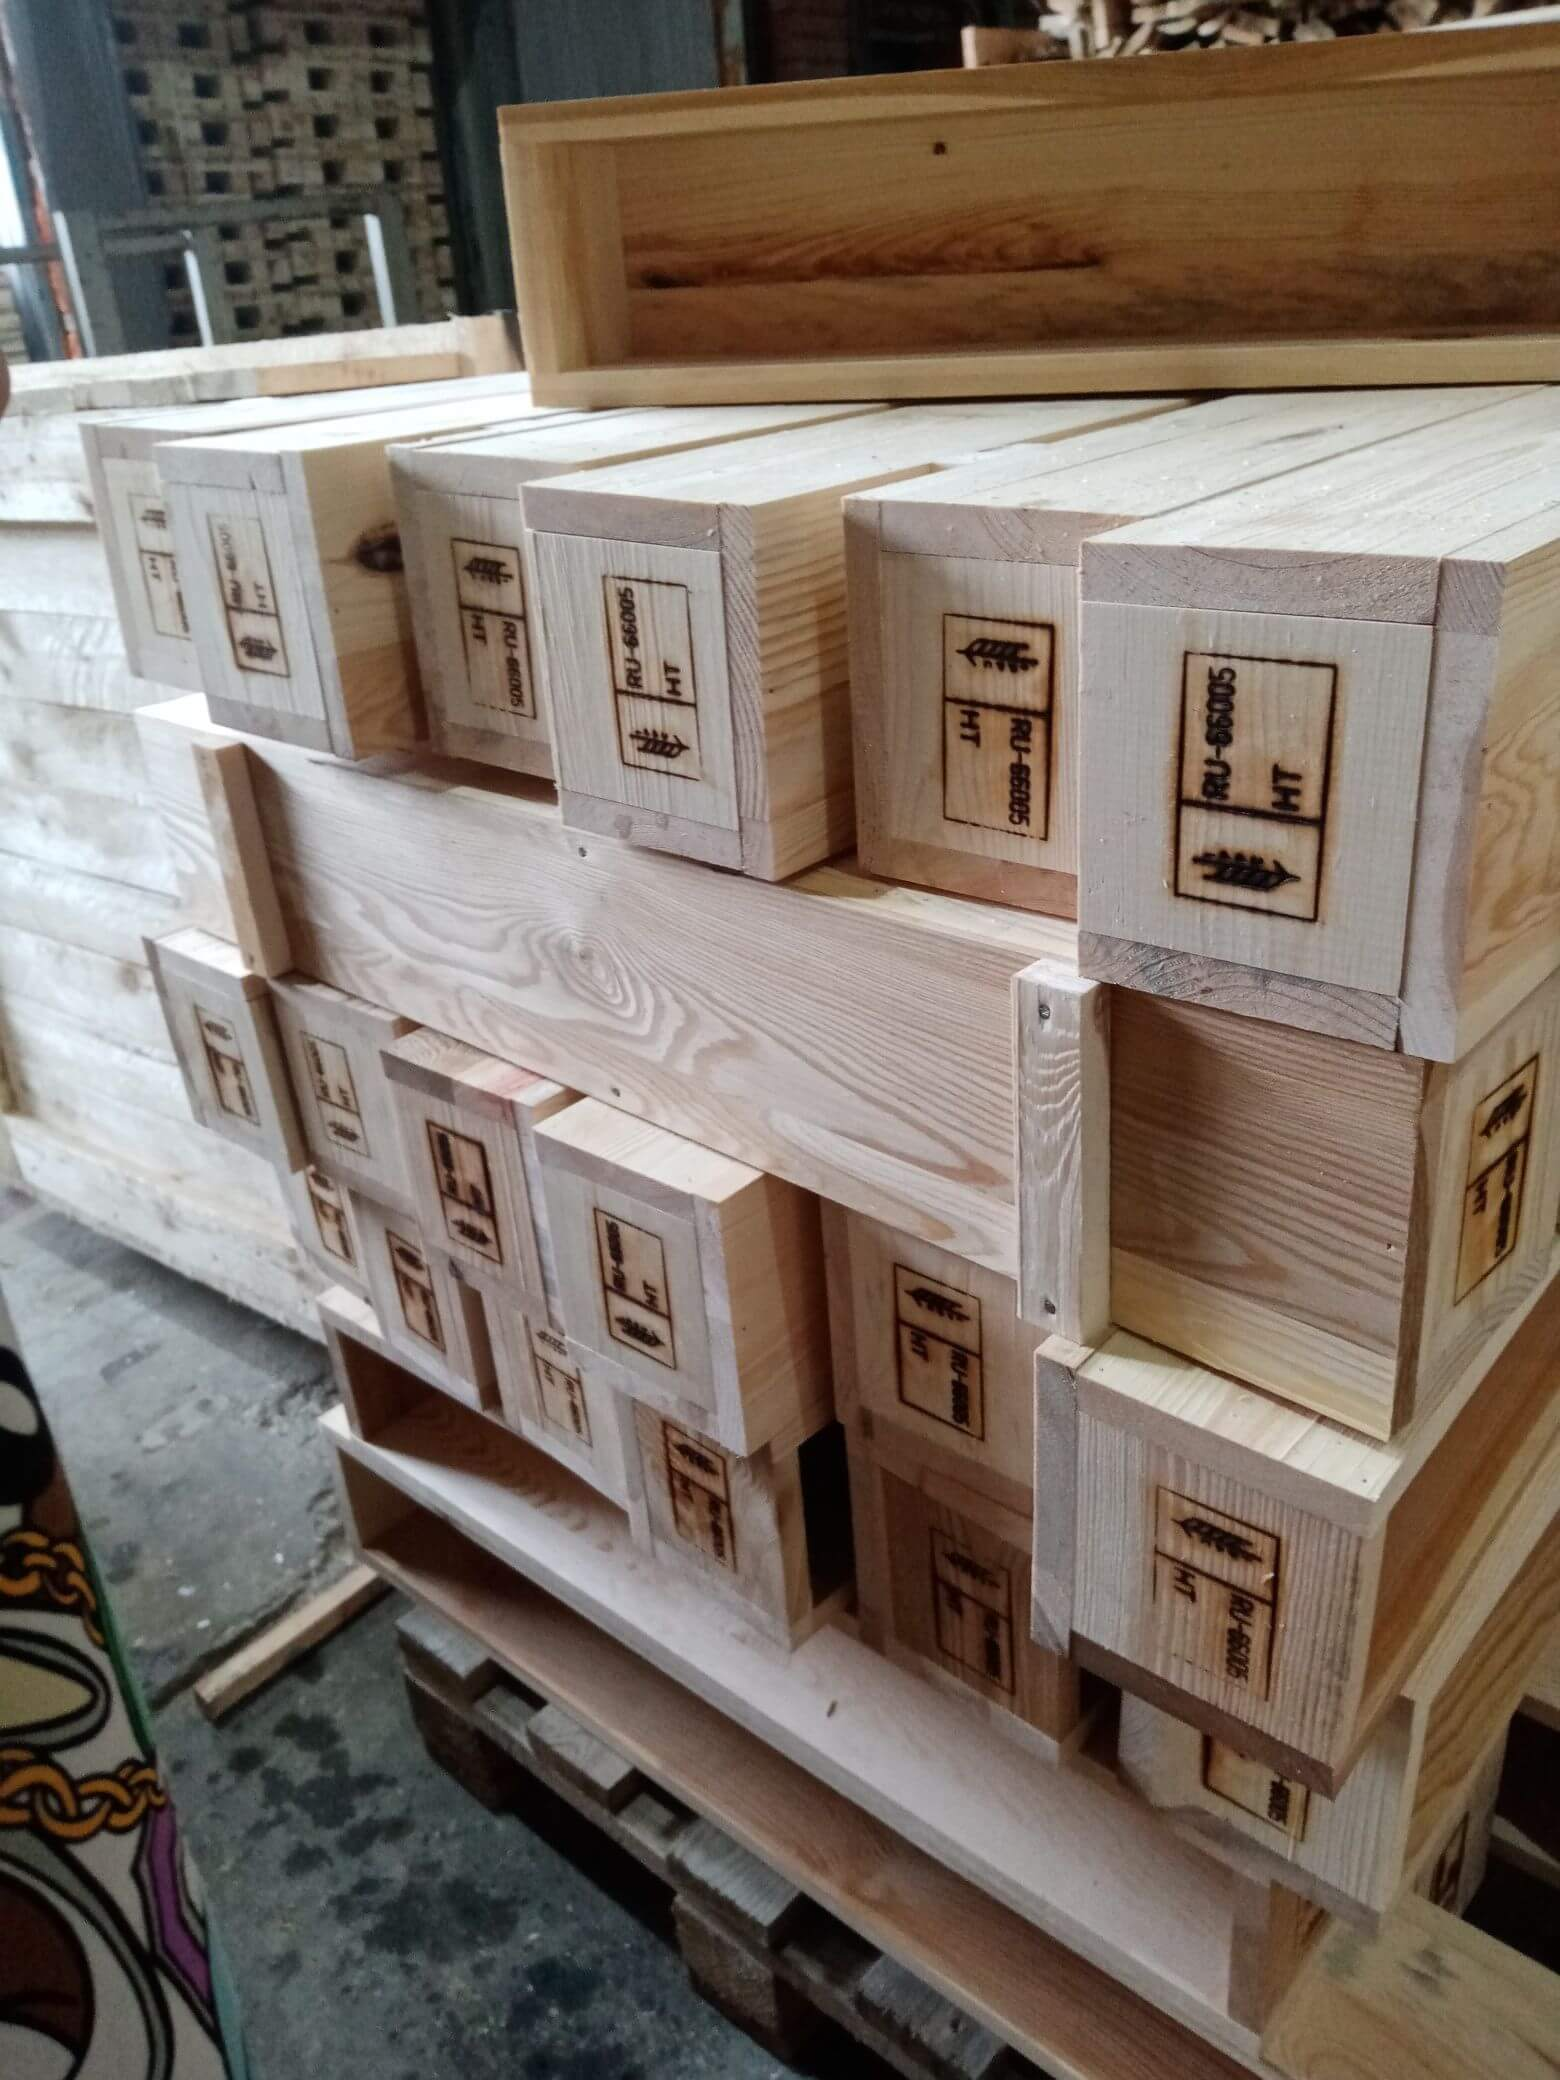 Ящик для грузов до 500 кг тип VI-3 ГОСТ 10198-91